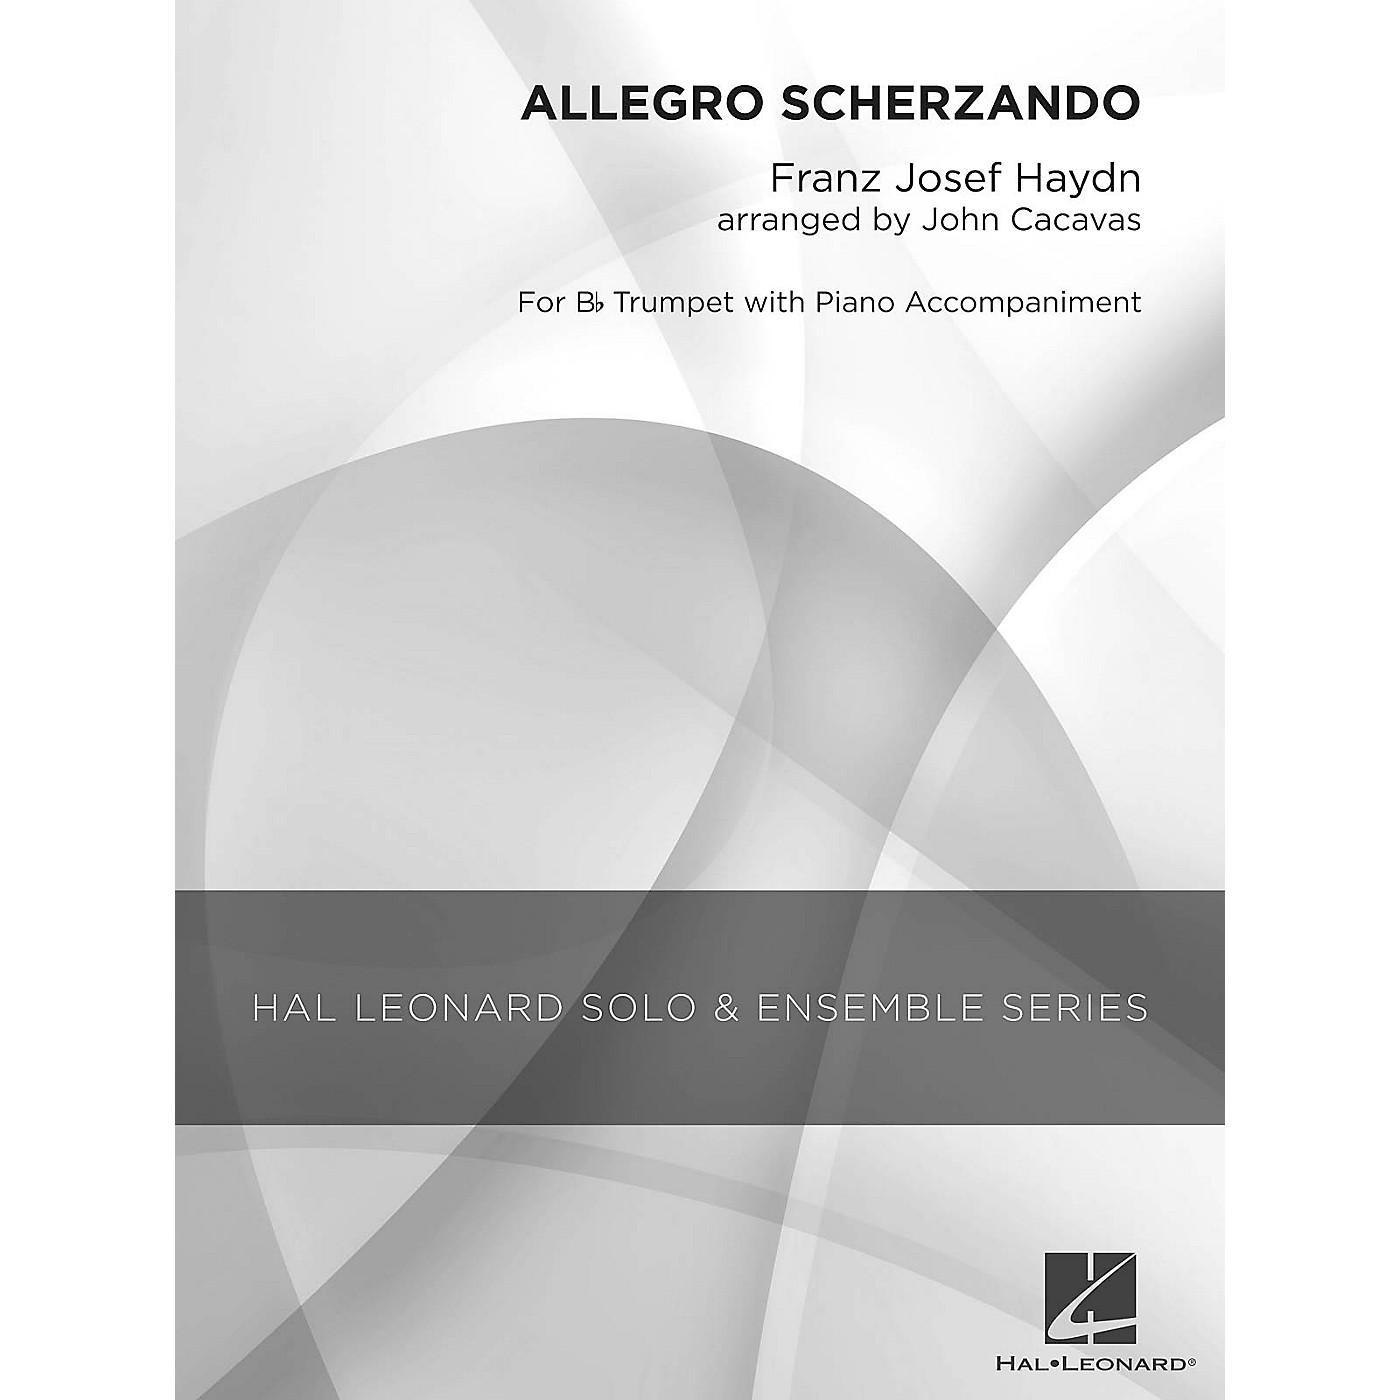 Hal Leonard Allegro Scherzando (Grade 2.5 Trumpet Solo) Concert Band Level 2.5 Arranged by John Cacavas thumbnail